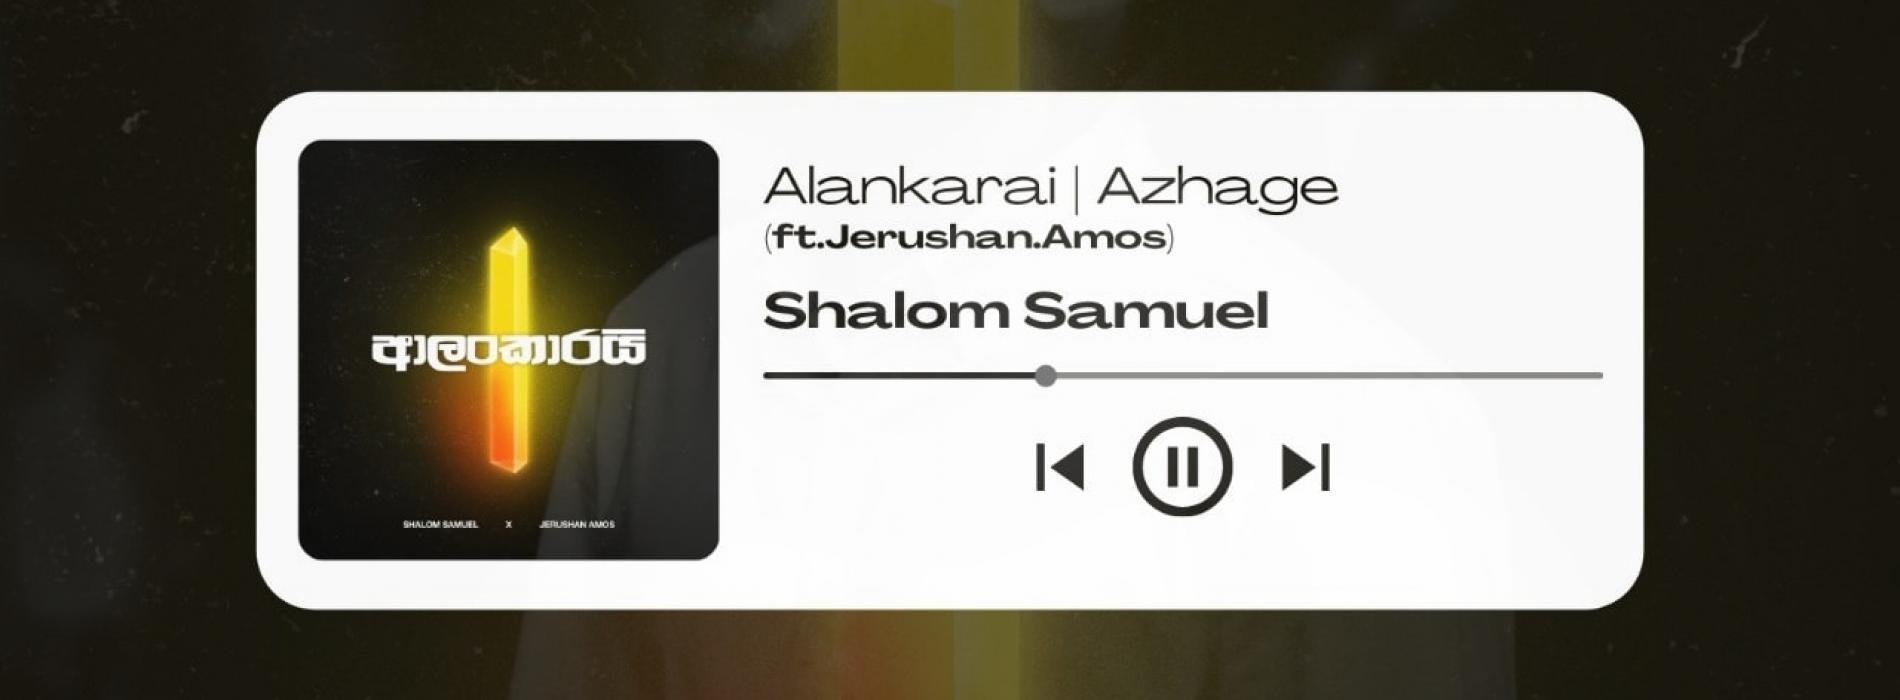 New Music : Shalom Samuel Ft Jerushan Amos Stephen – අලංකාරයි | Alankarai | Sinhala Version Of Azhage